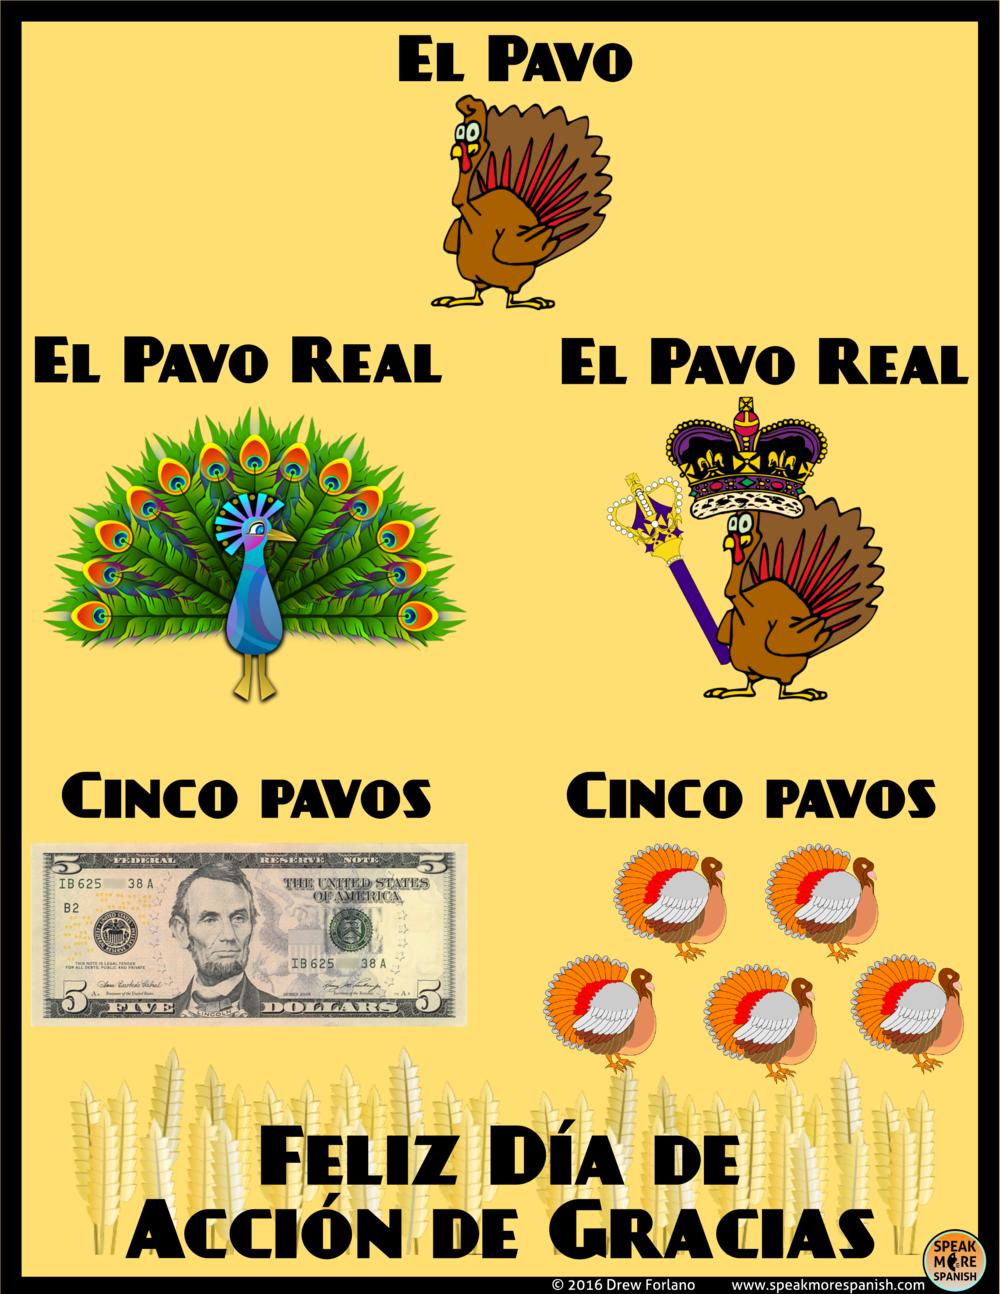 Free Spanish poster dia de accion de gracias gratis.png